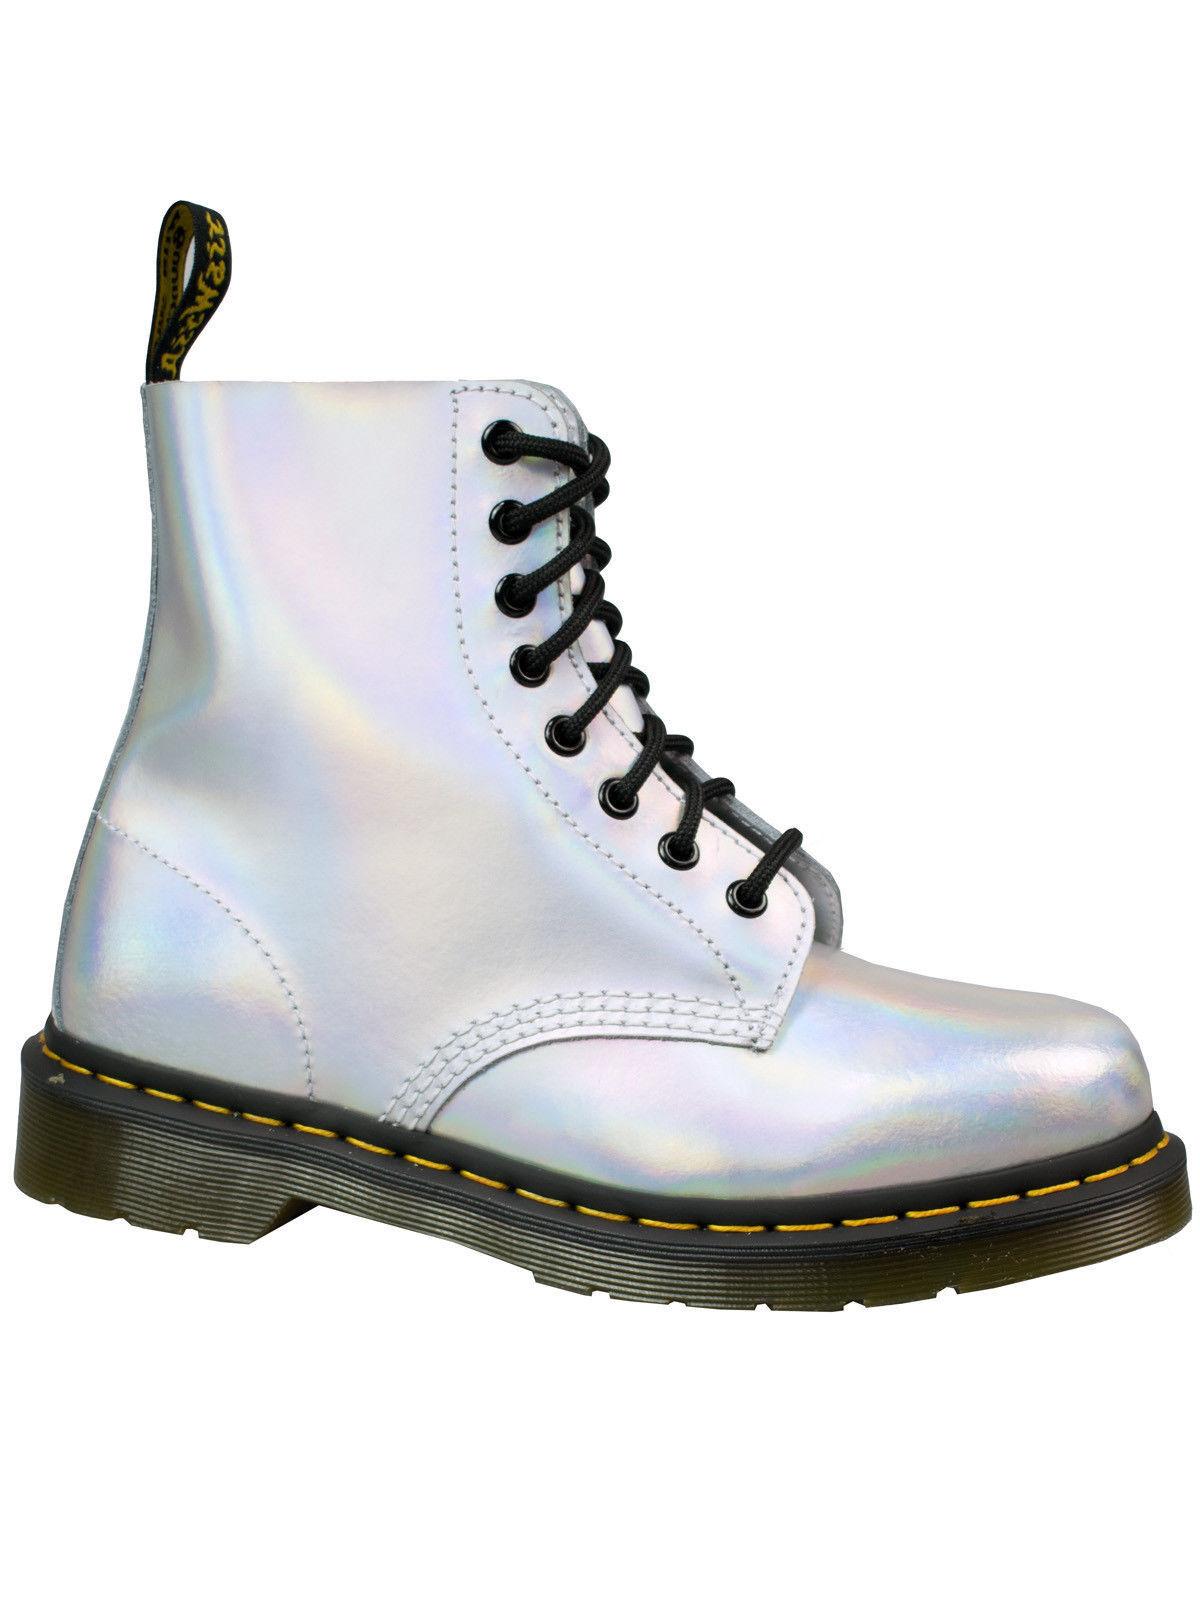 Dr. Martens 8-loch Metallic Stiefel Pascal Leder Silver Lazer Metallic 8-loch 23551073 #5136 f7dc0a